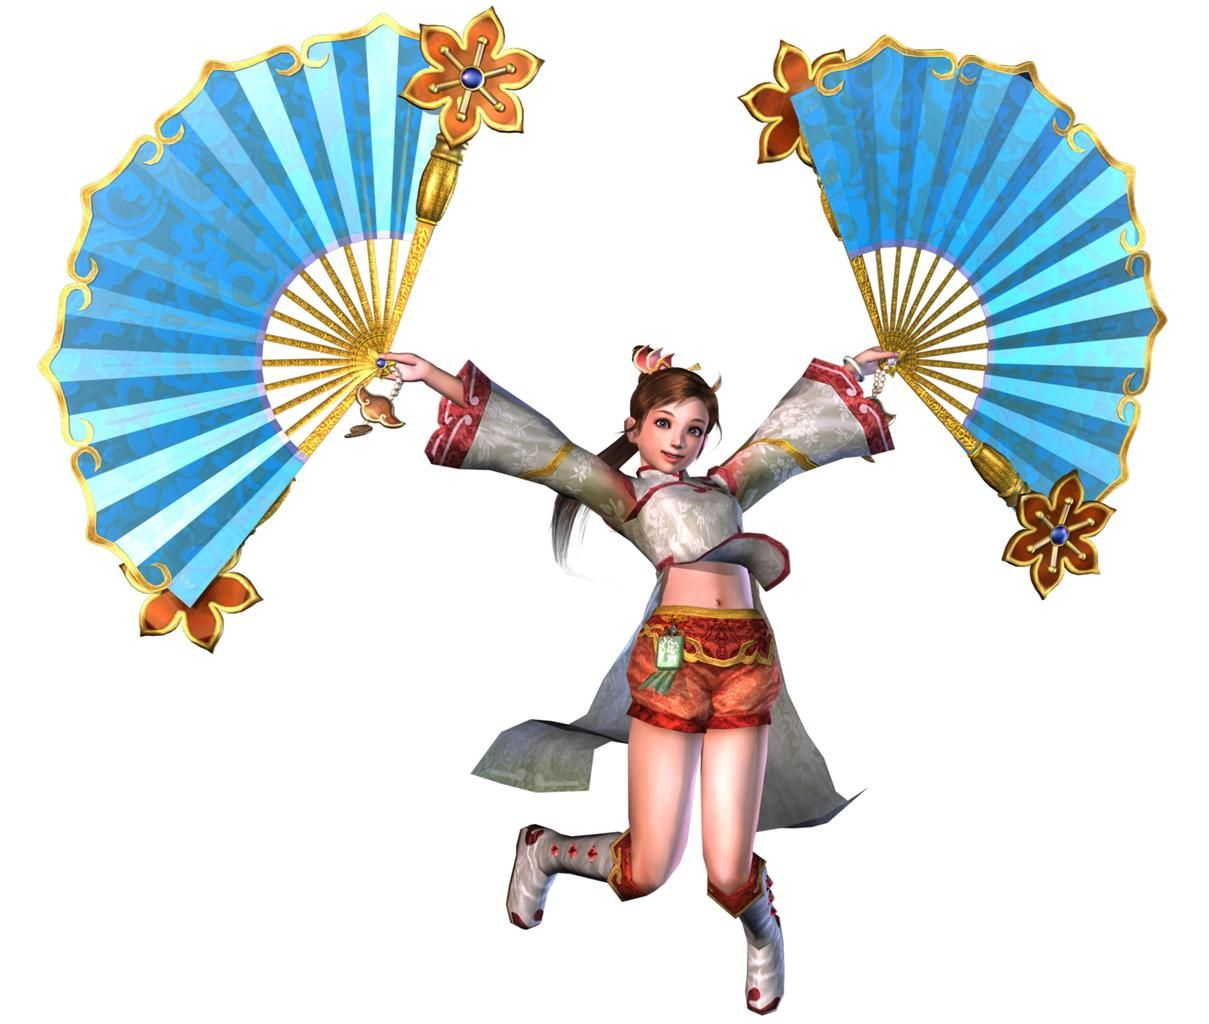 Warriors Orochi 2 Psp How To Unlock All Characters: Dynasty Warriors & Samurai Warriors